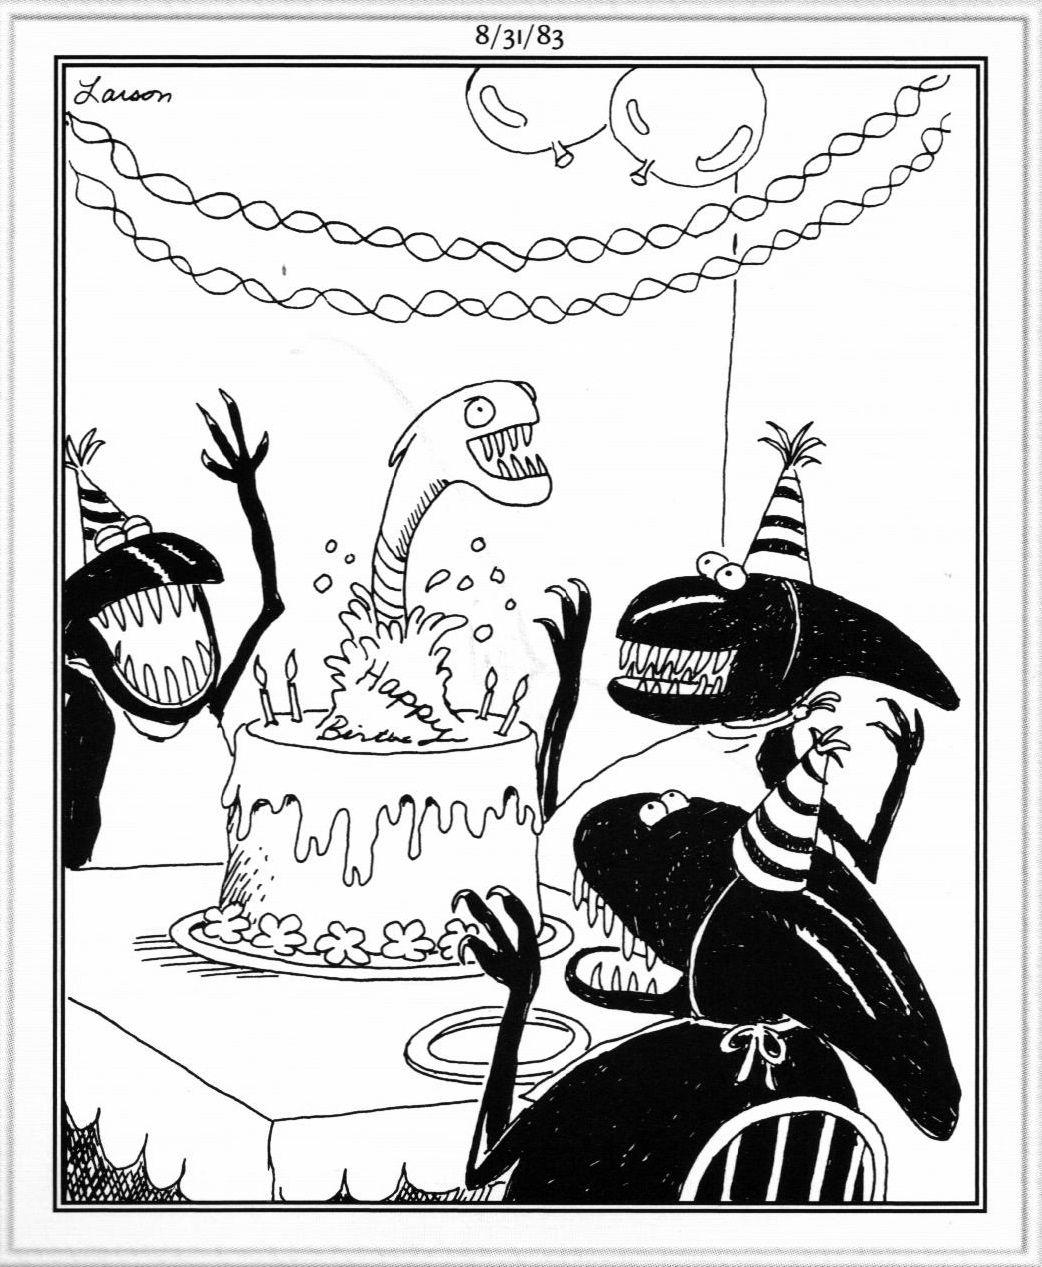 Far Side Cartoon Collection Lol Rofl Com Humor Pinterest